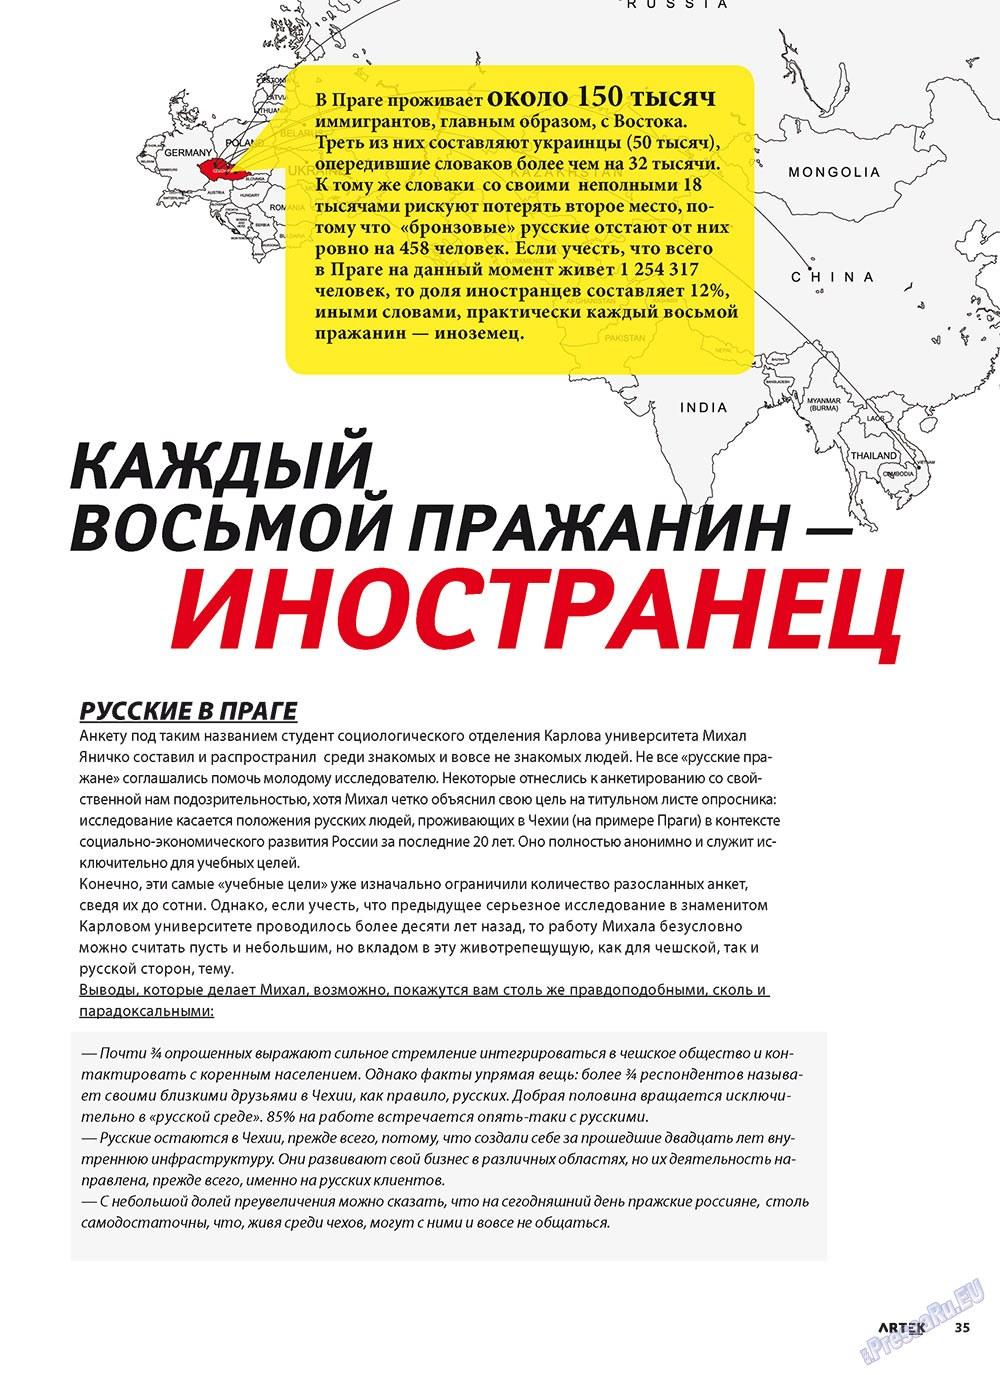 Артек (журнал). 2011 год, номер 2, стр. 37